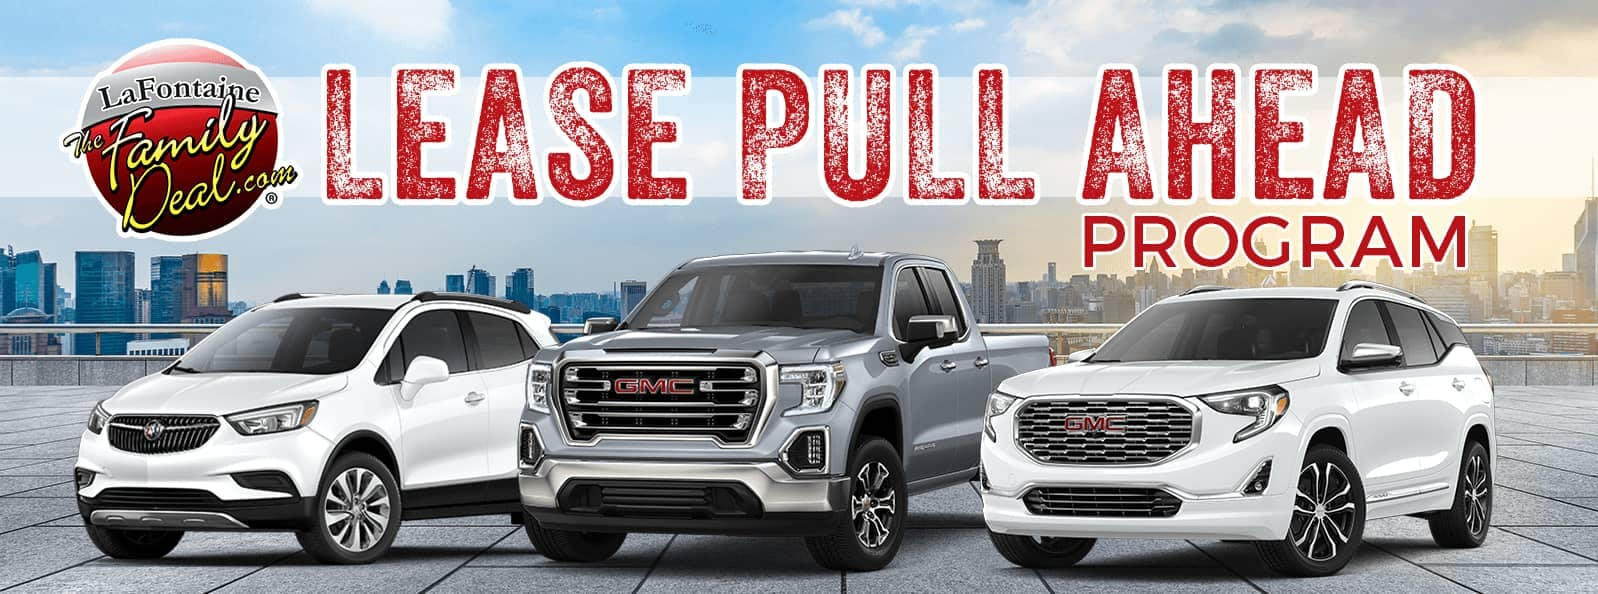 Lease Pull Ahead Program Banner